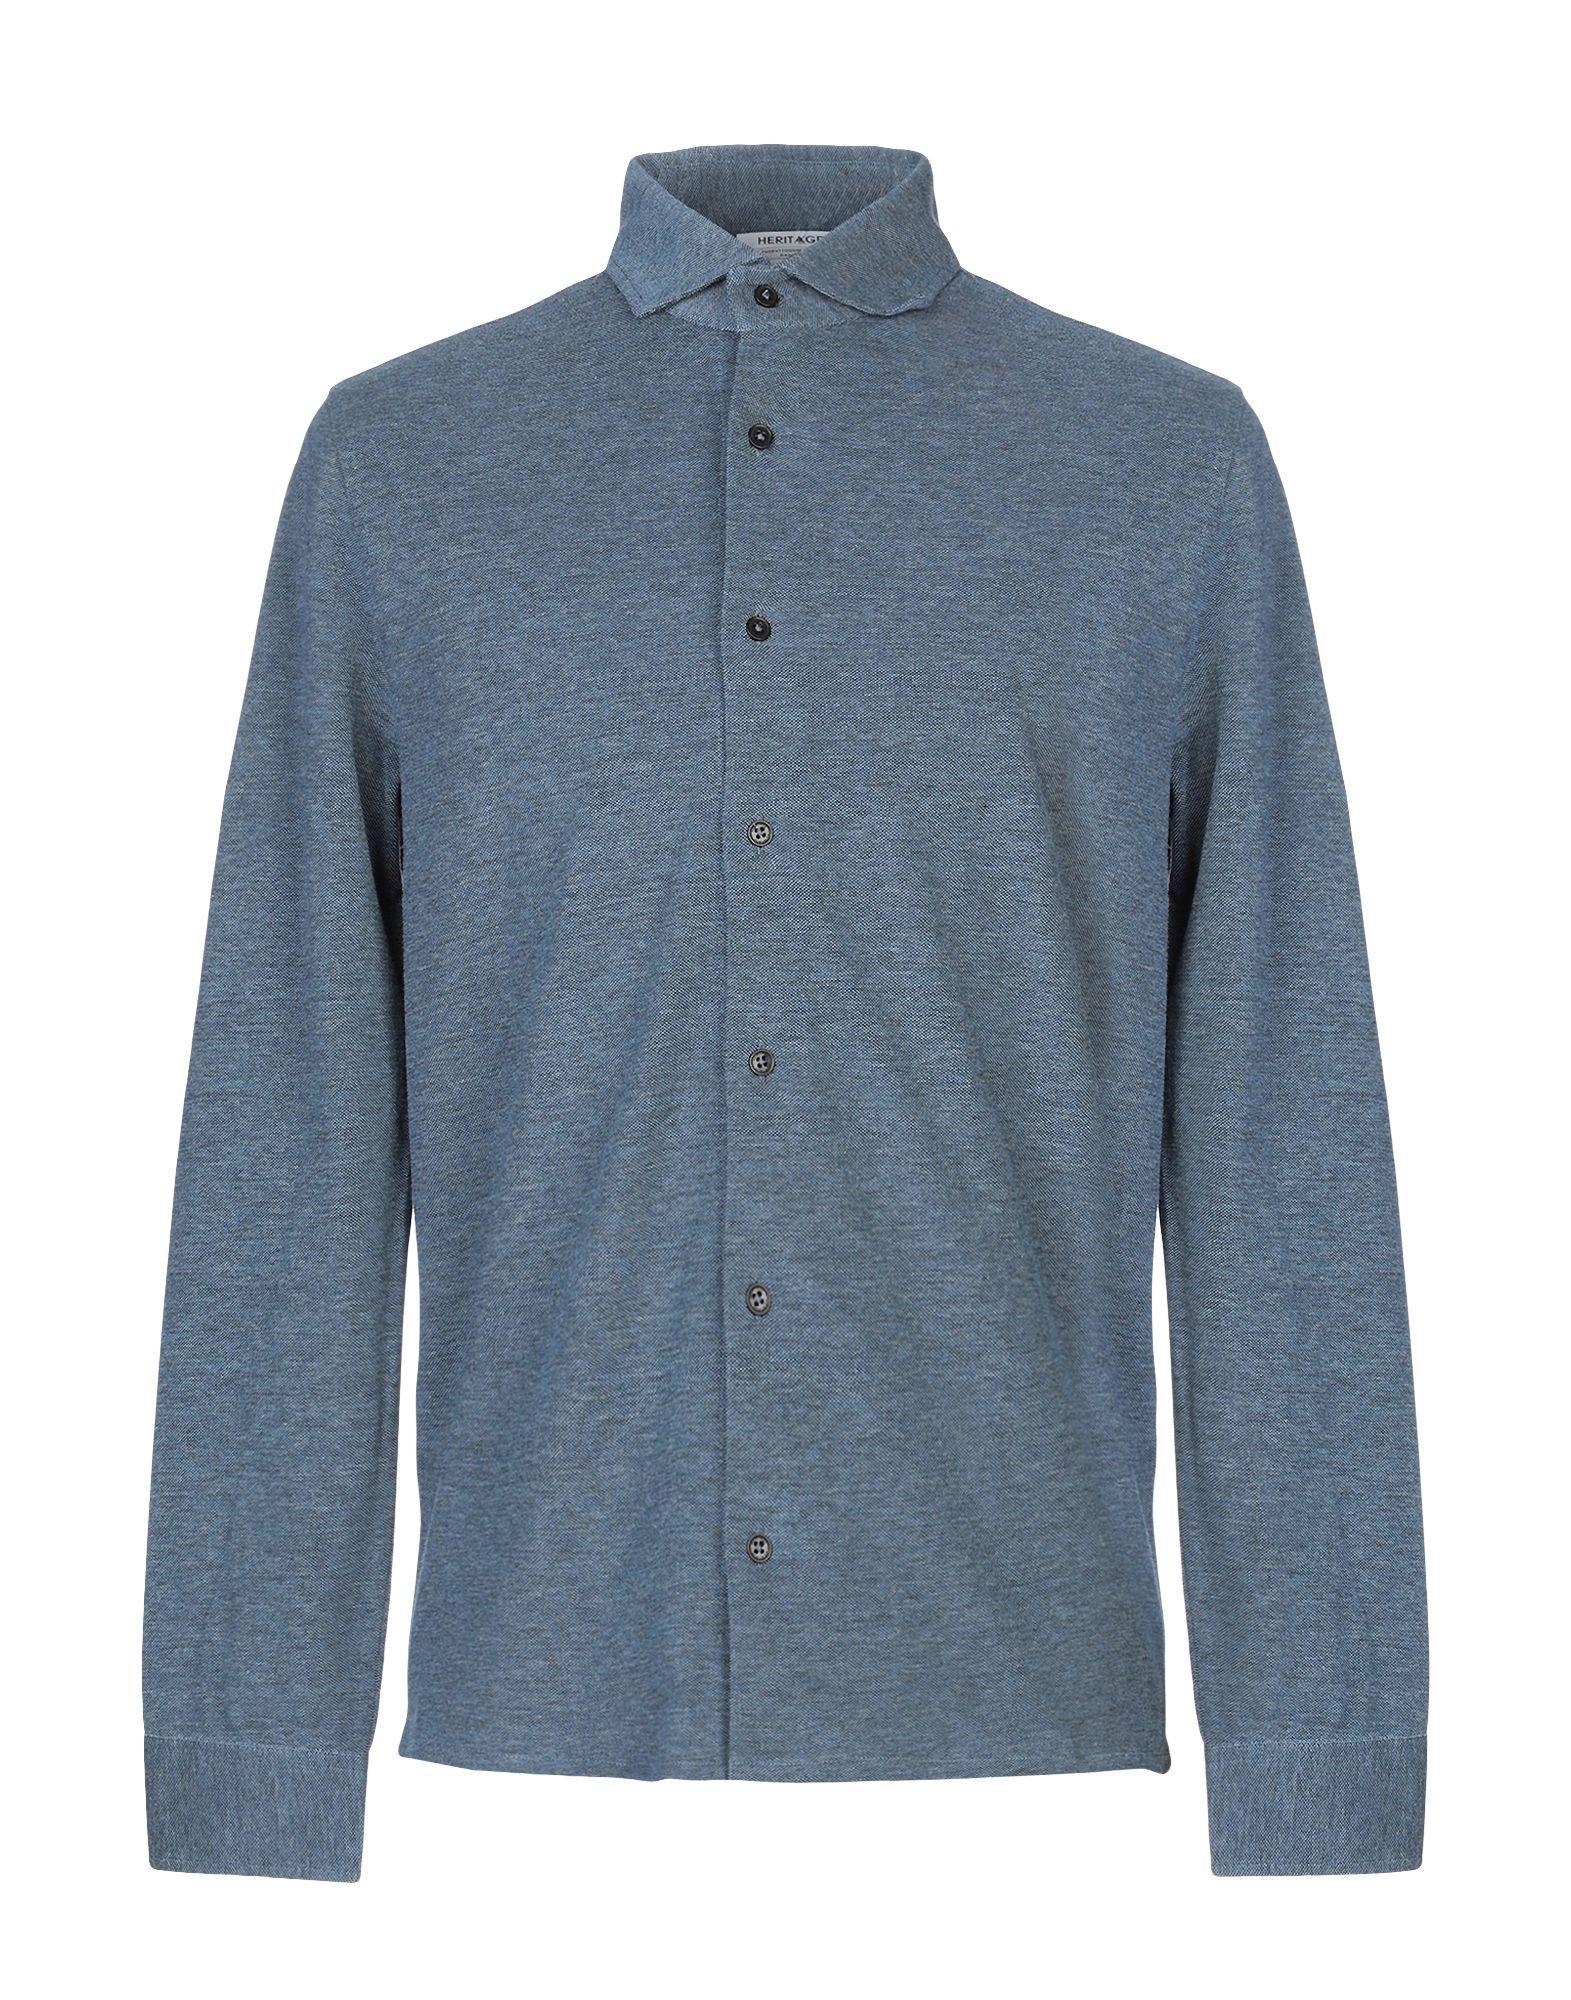 SHIRTS Heritage Slate blue Man Cotton